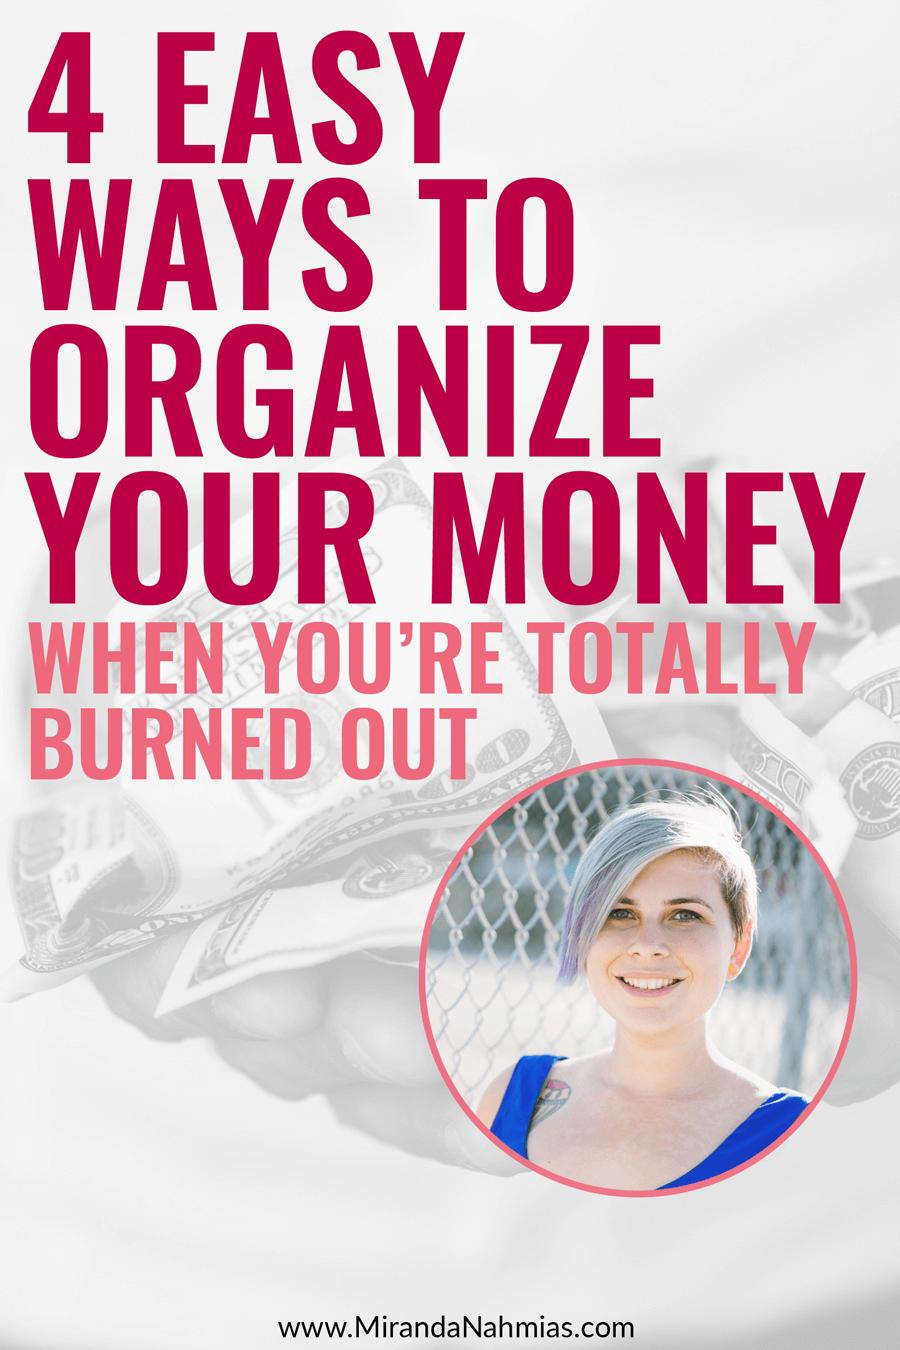 4 Easy Ways to Organize Your Money When You're Totally Burned Out // Miranda Nahmias